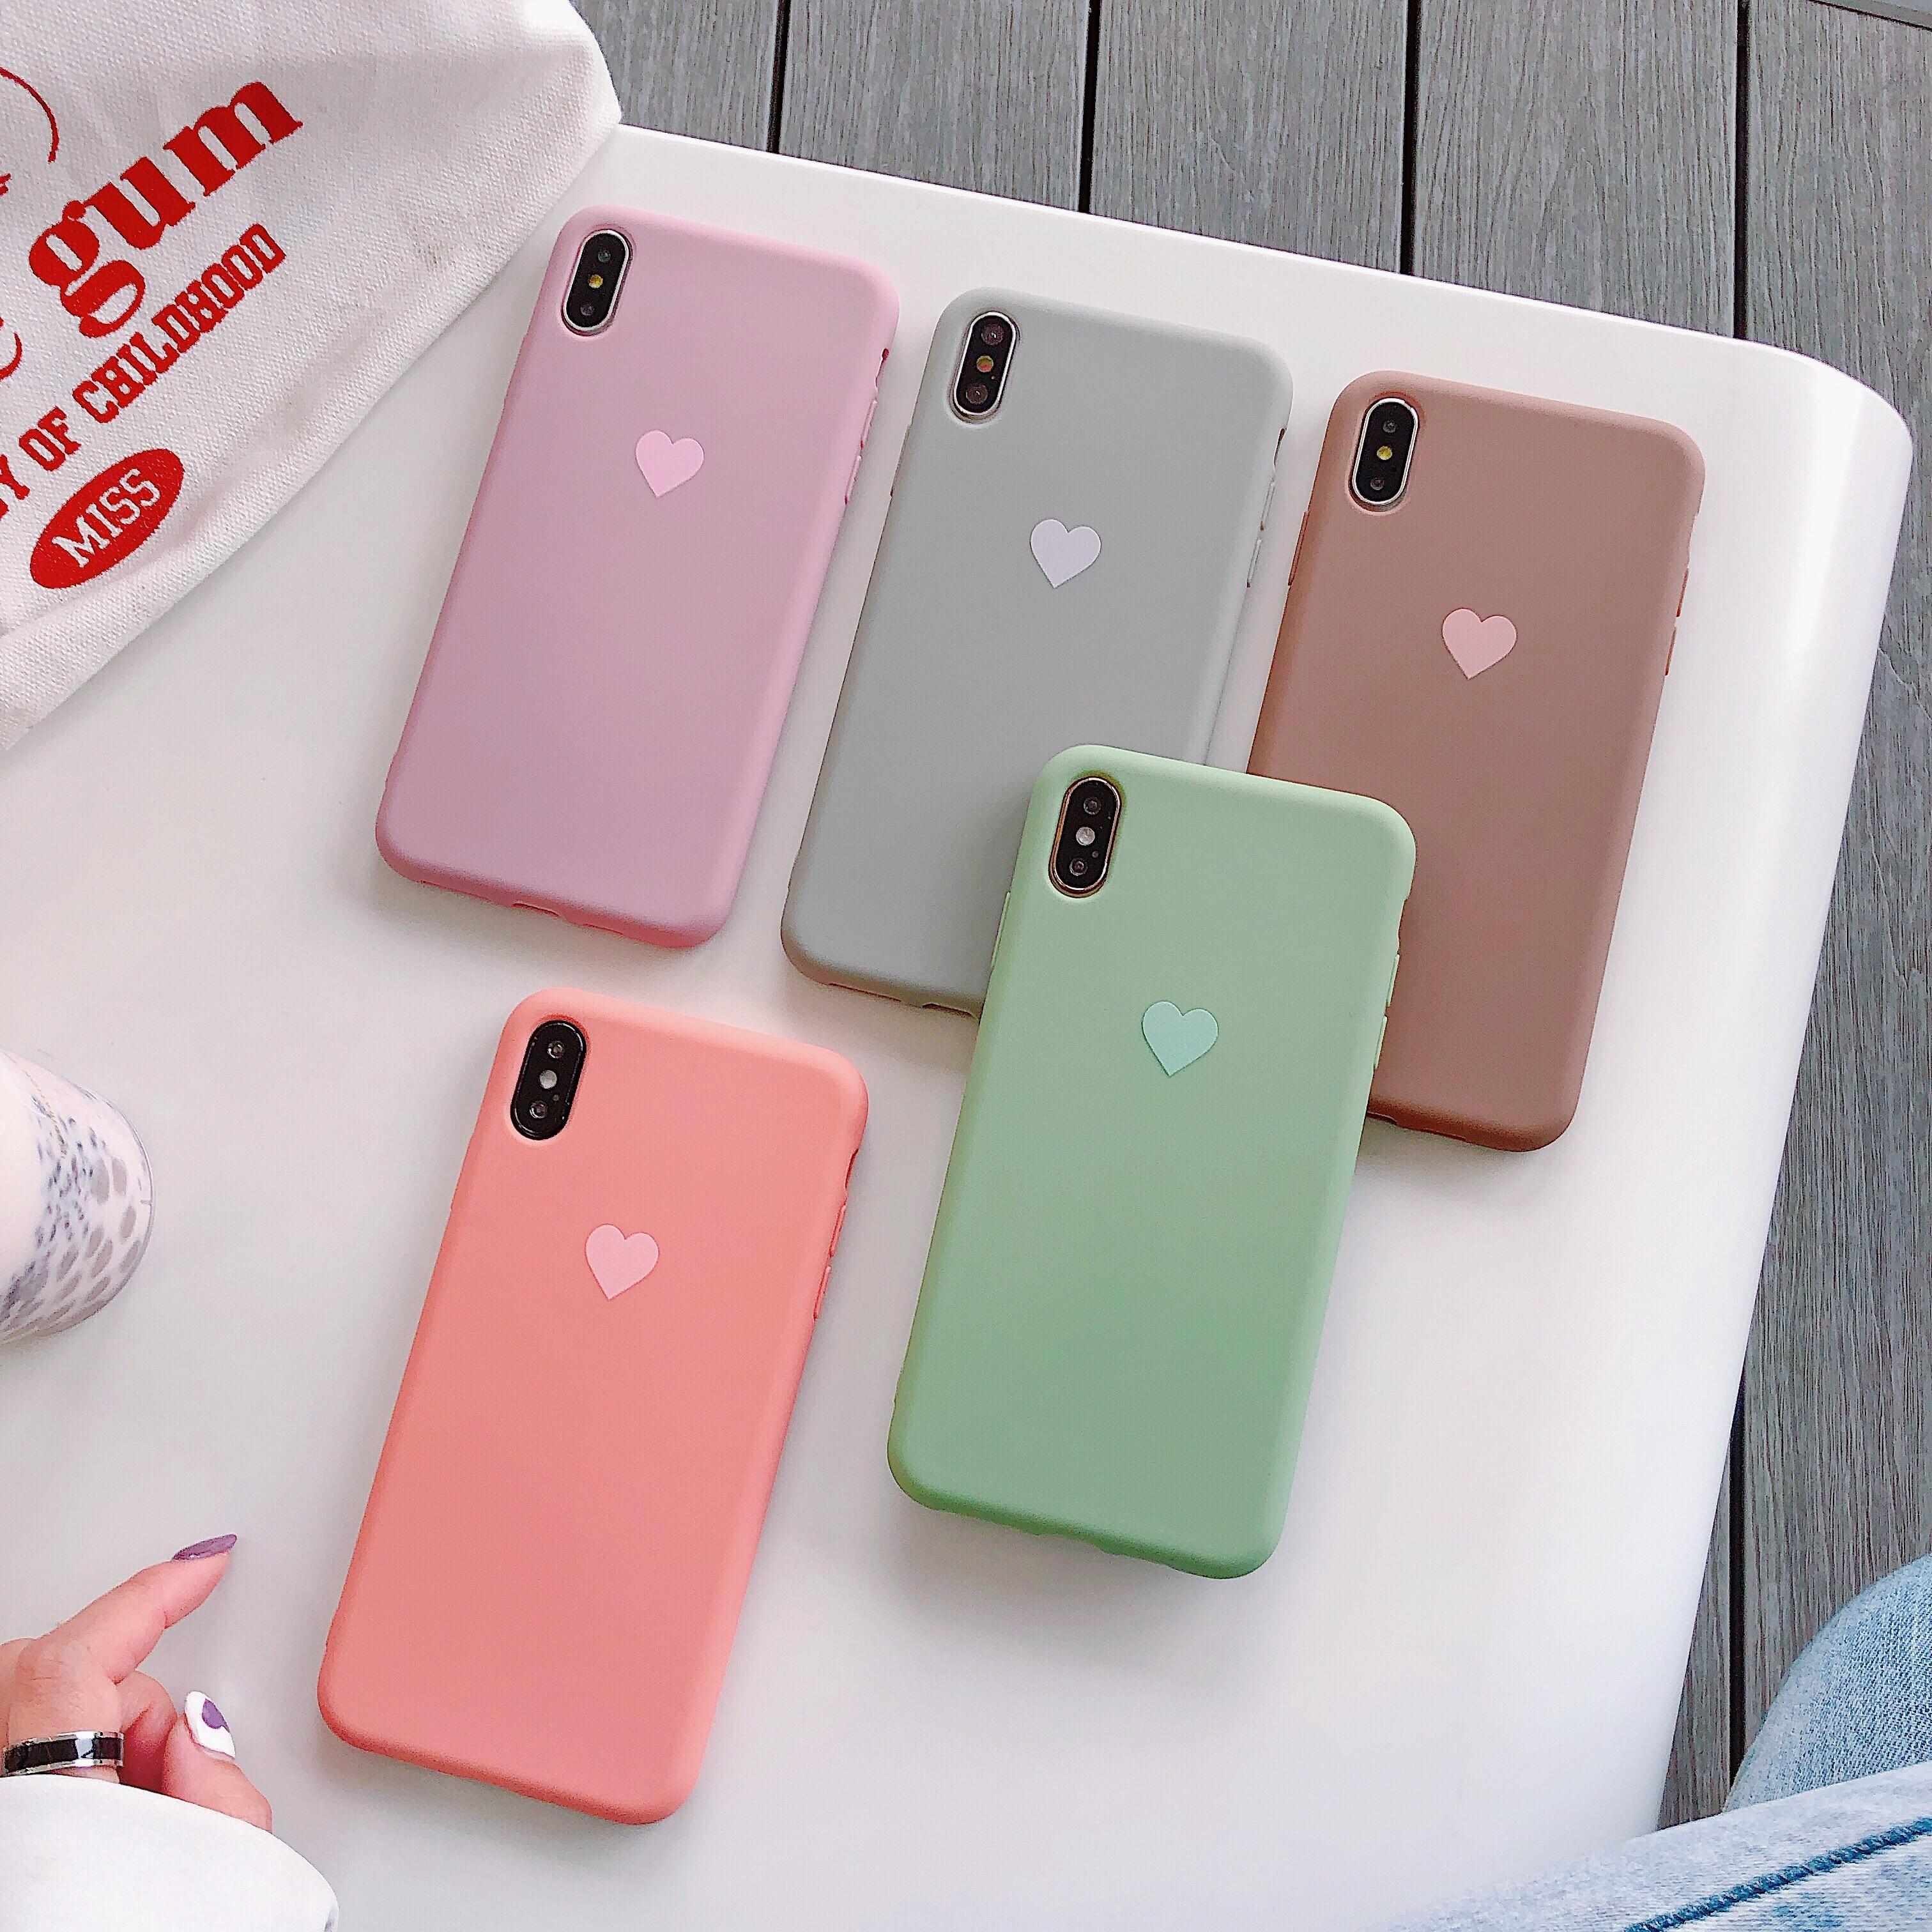 Funda de silicona Color sólido lindo liso caramelo para iPhone 6 6S 7 7P 8 8P X XS XSmax suave TPU Funda amor